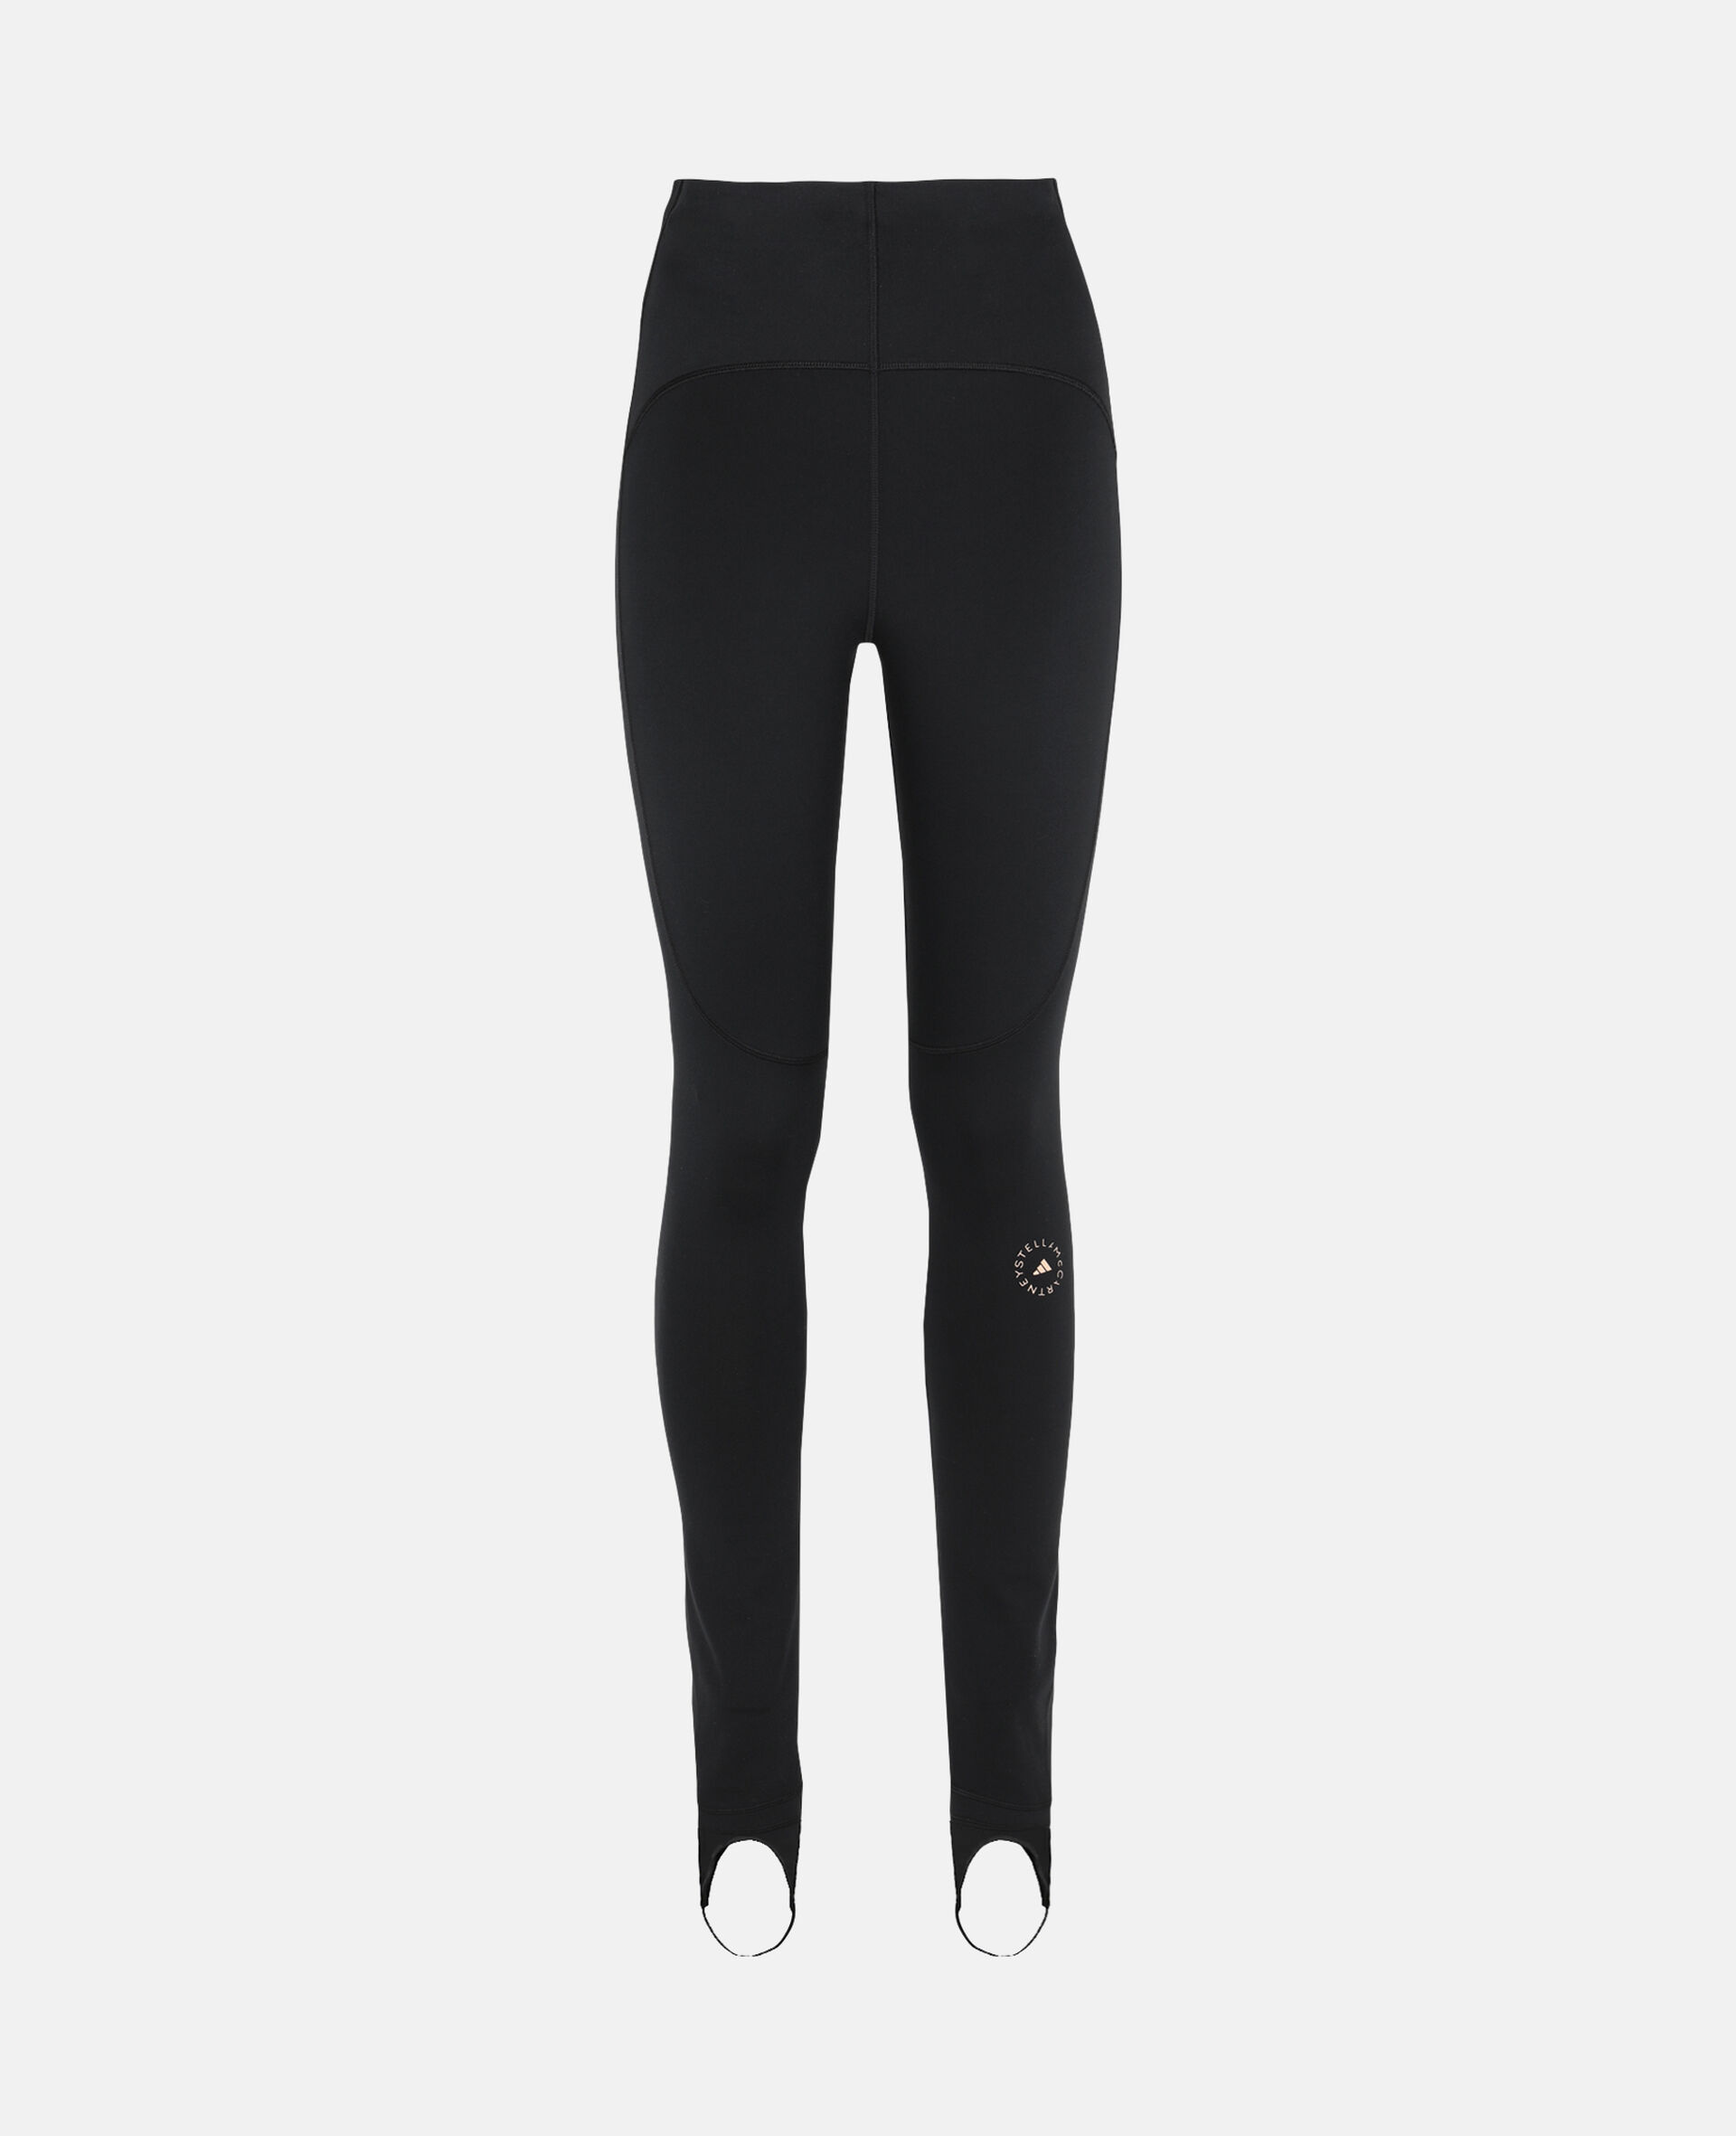 TrueStrength Yoga 紧身裤-黑色-large image number 0